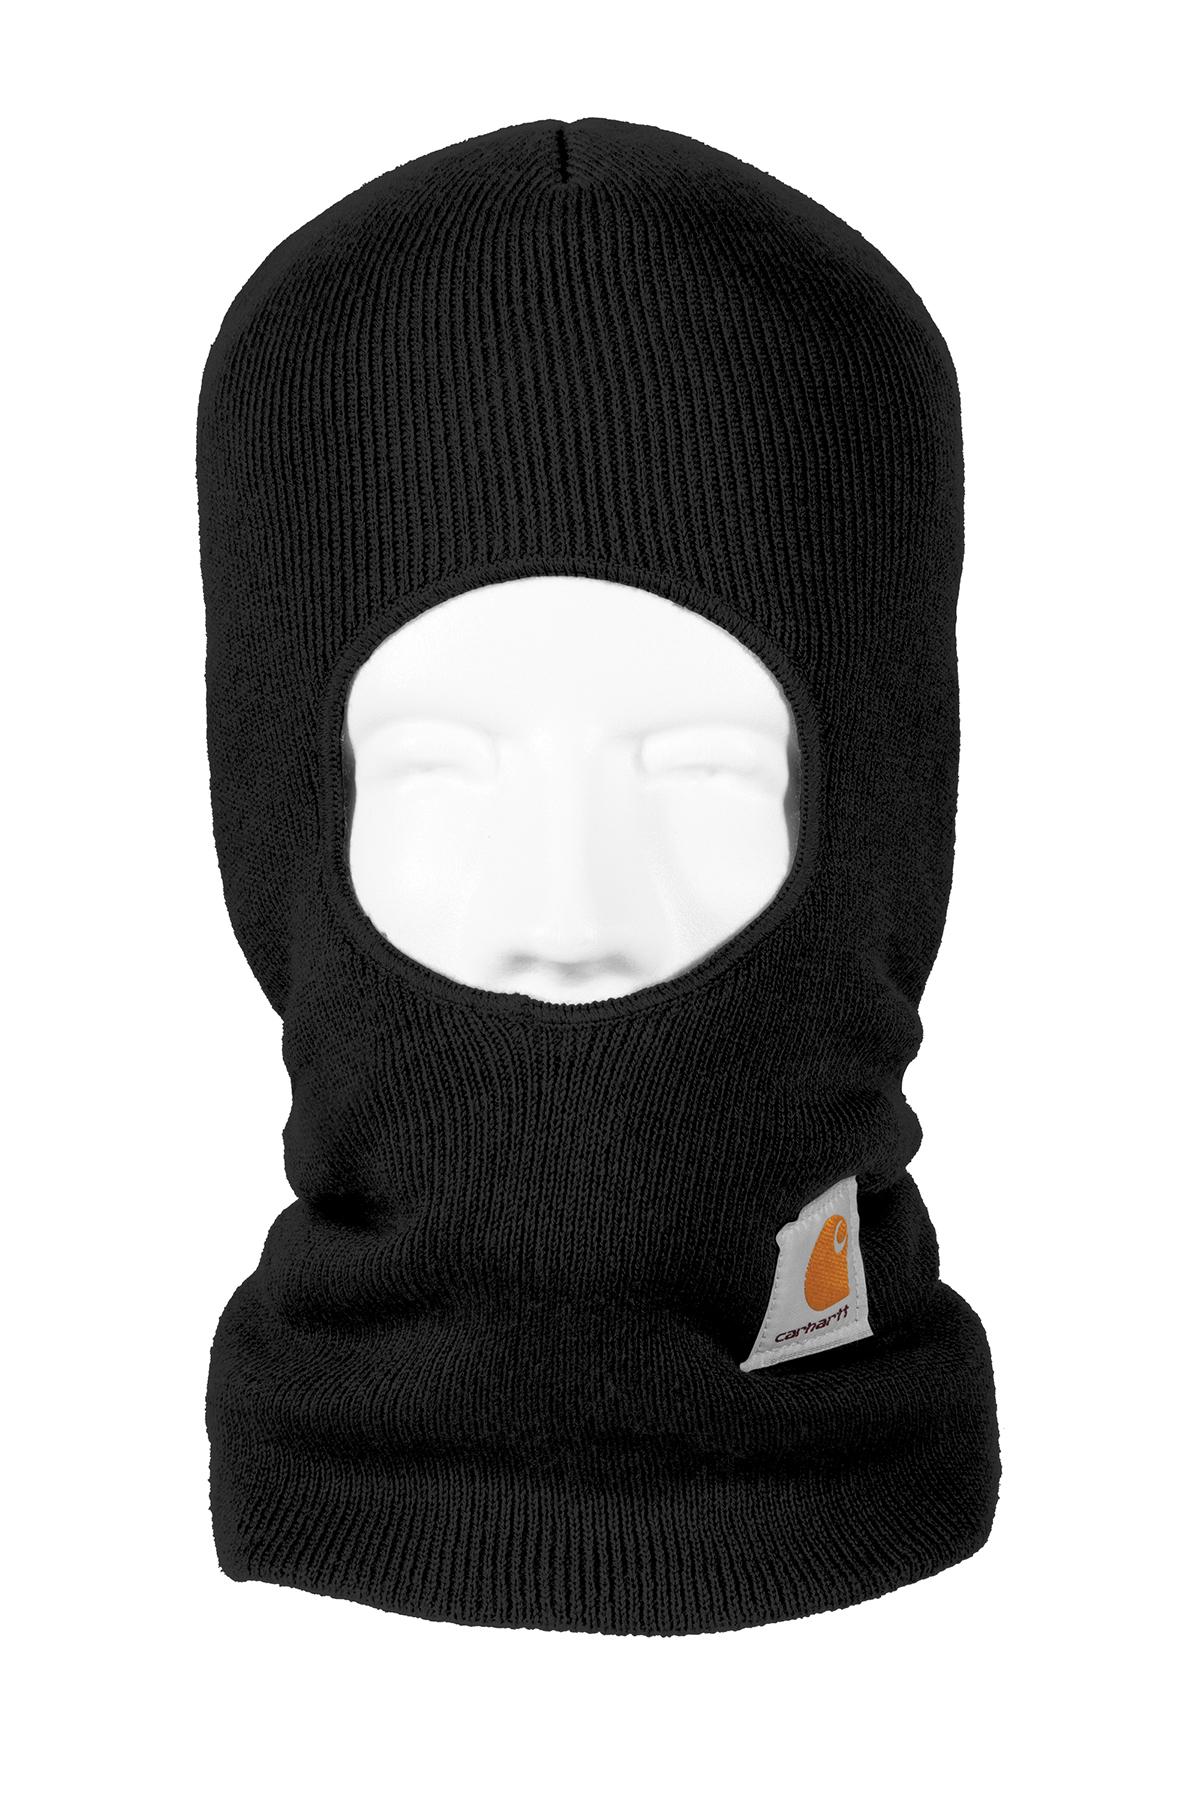 9e9c68c43 Carhartt CTA205 - Acrylic Knit Hat $12.99 - Headwear